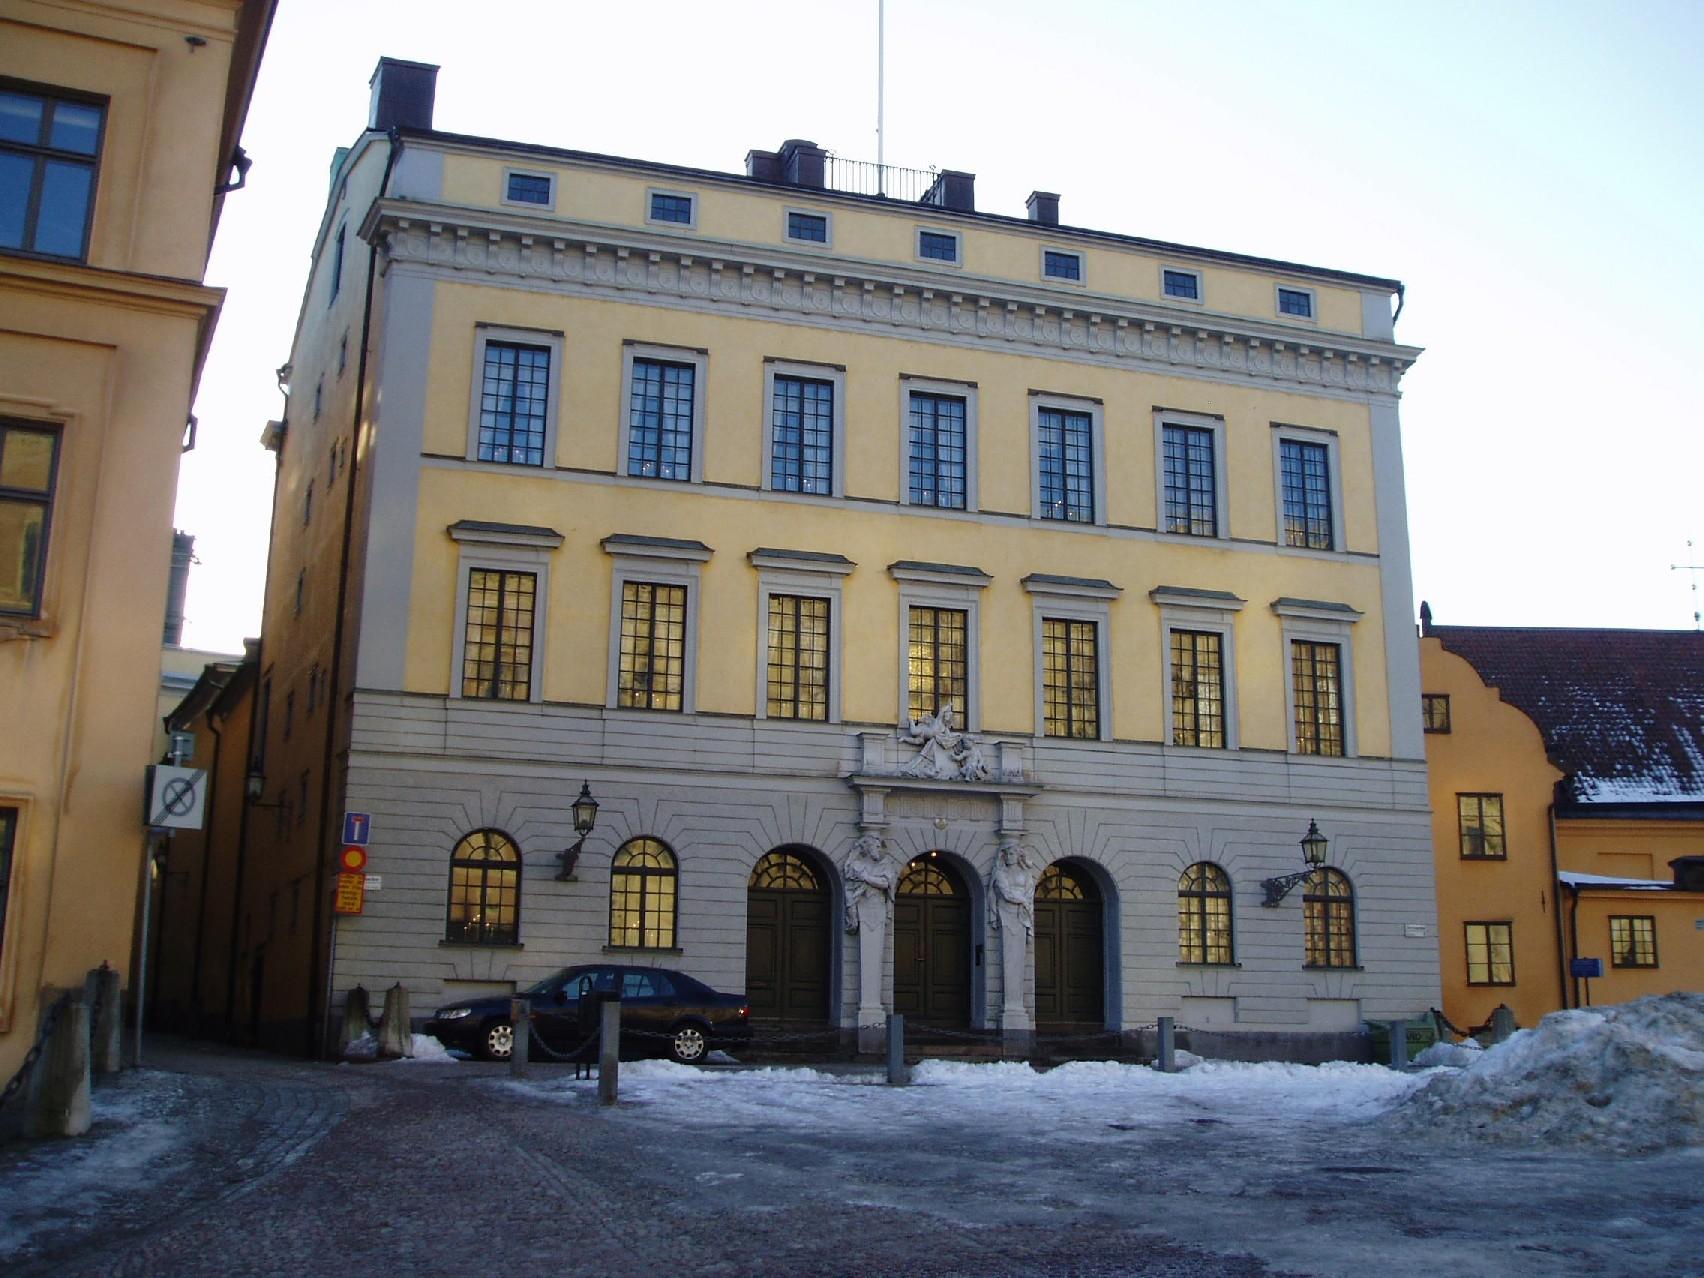 Tessinisches_palais_stockholm мл.jpg